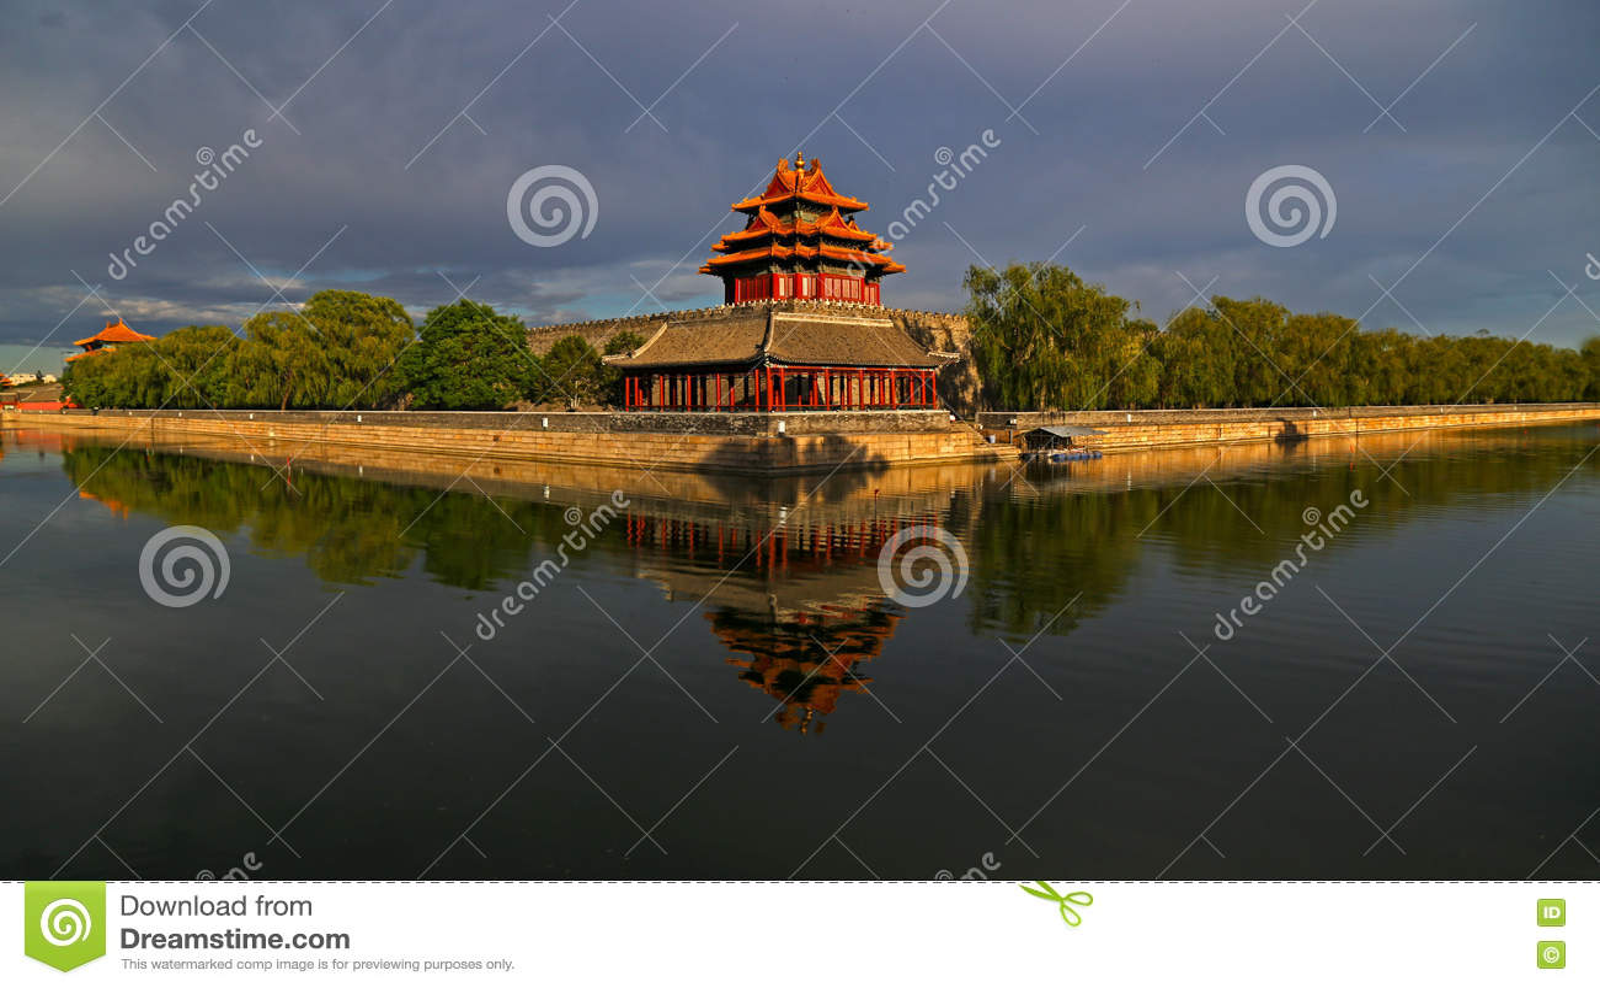 Download Beijing Forbidden City Turret Stock Photo - Image of color, city: 79455062